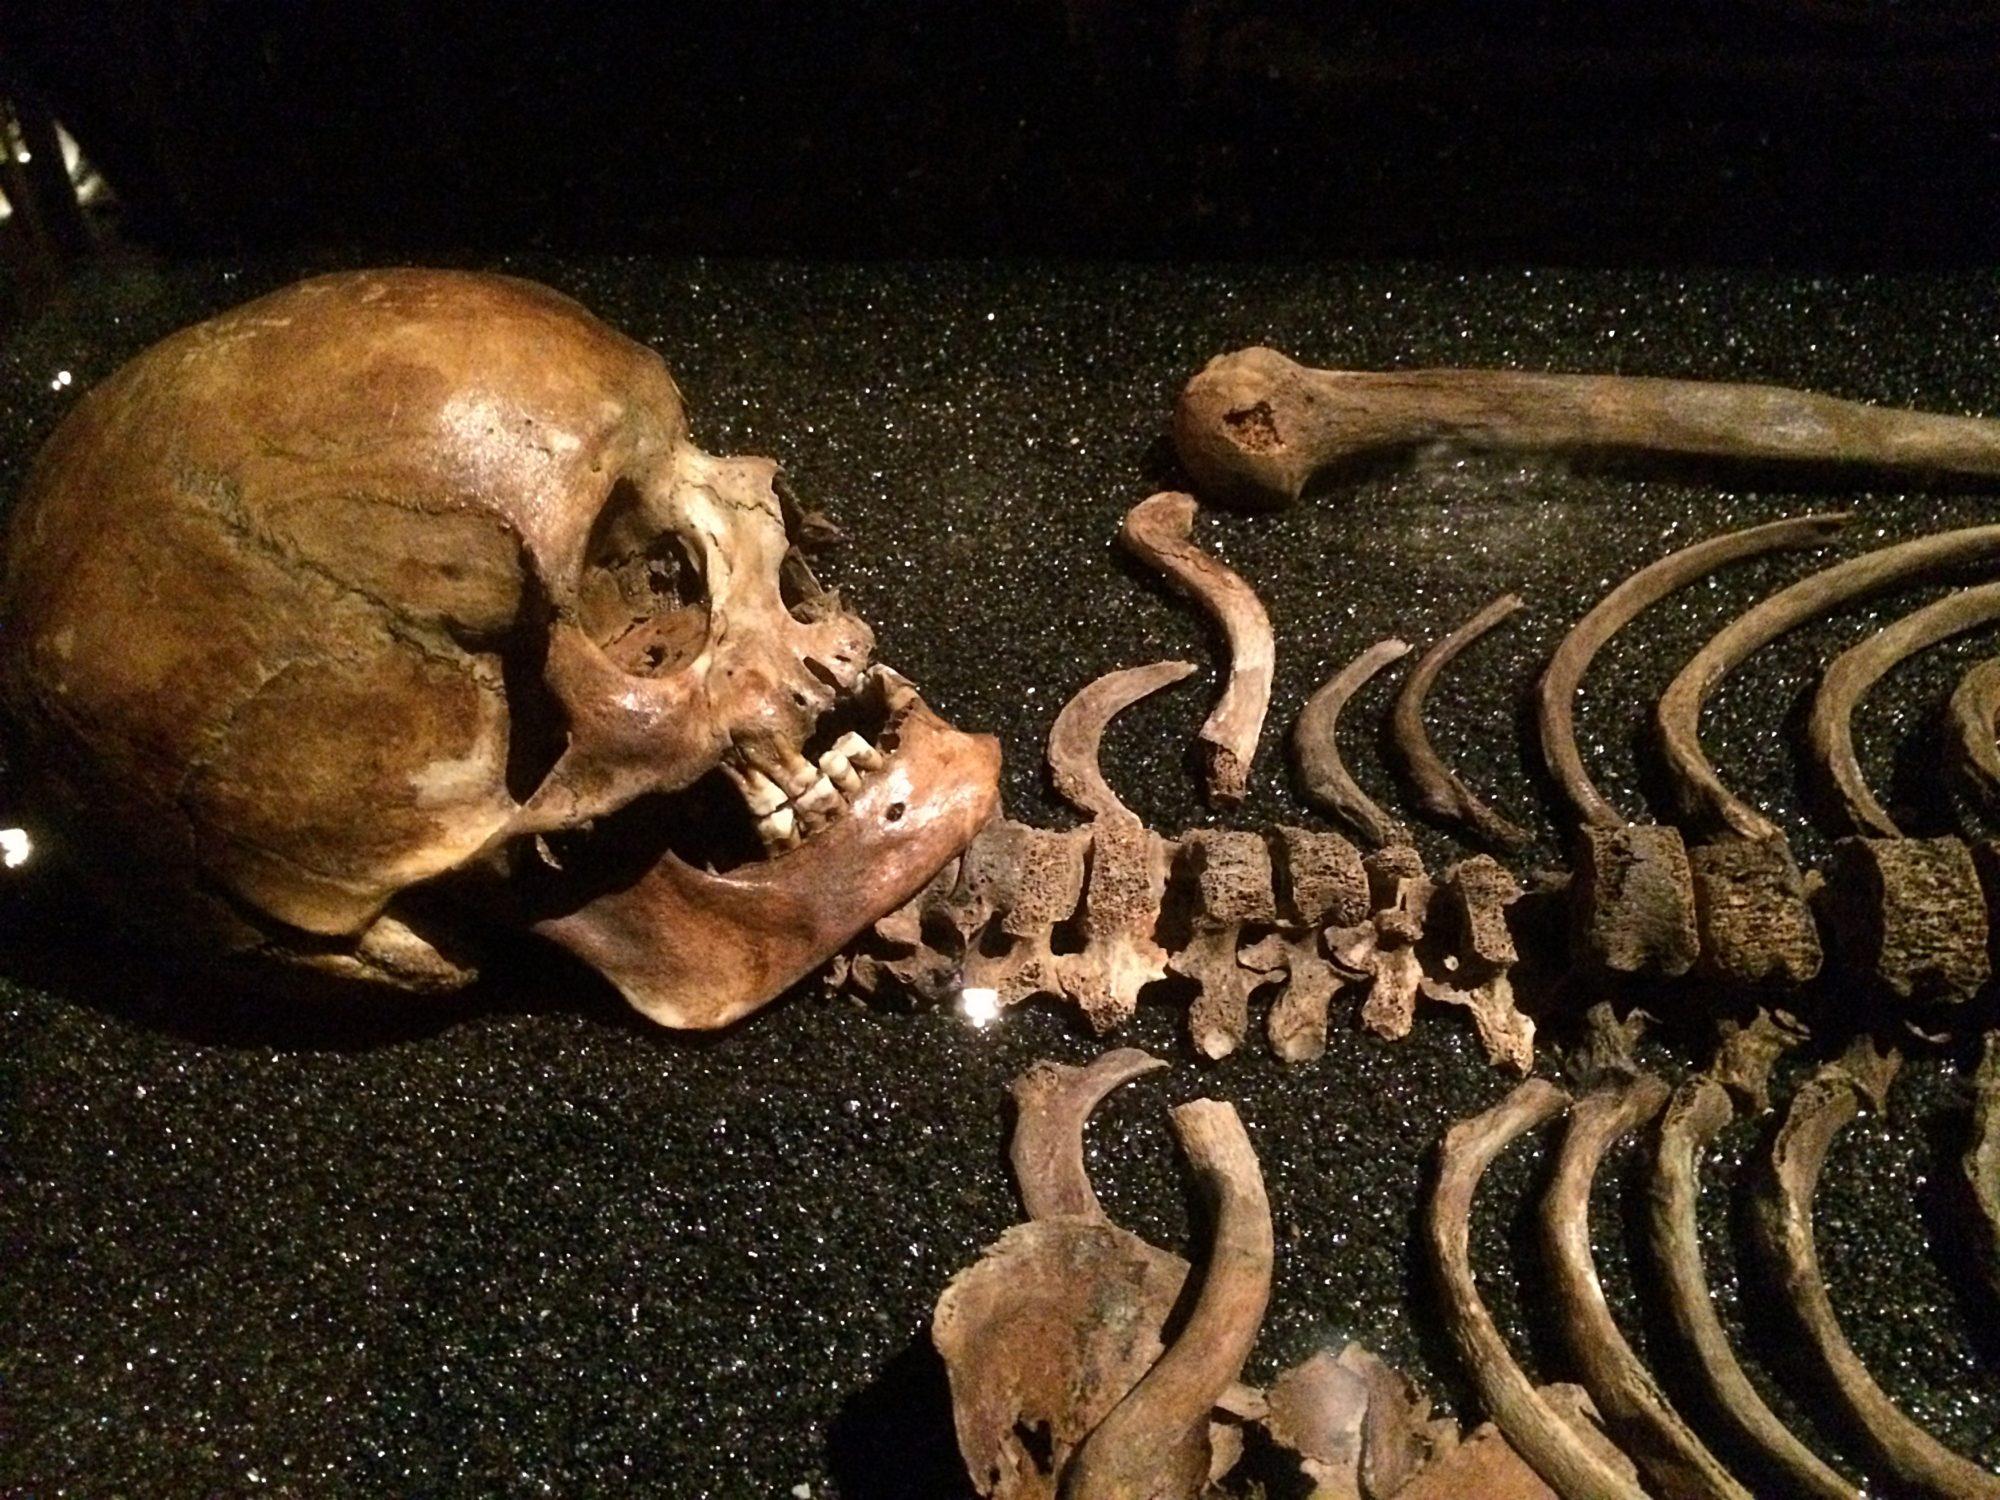 Vasa Museum Skulls and Skeletons